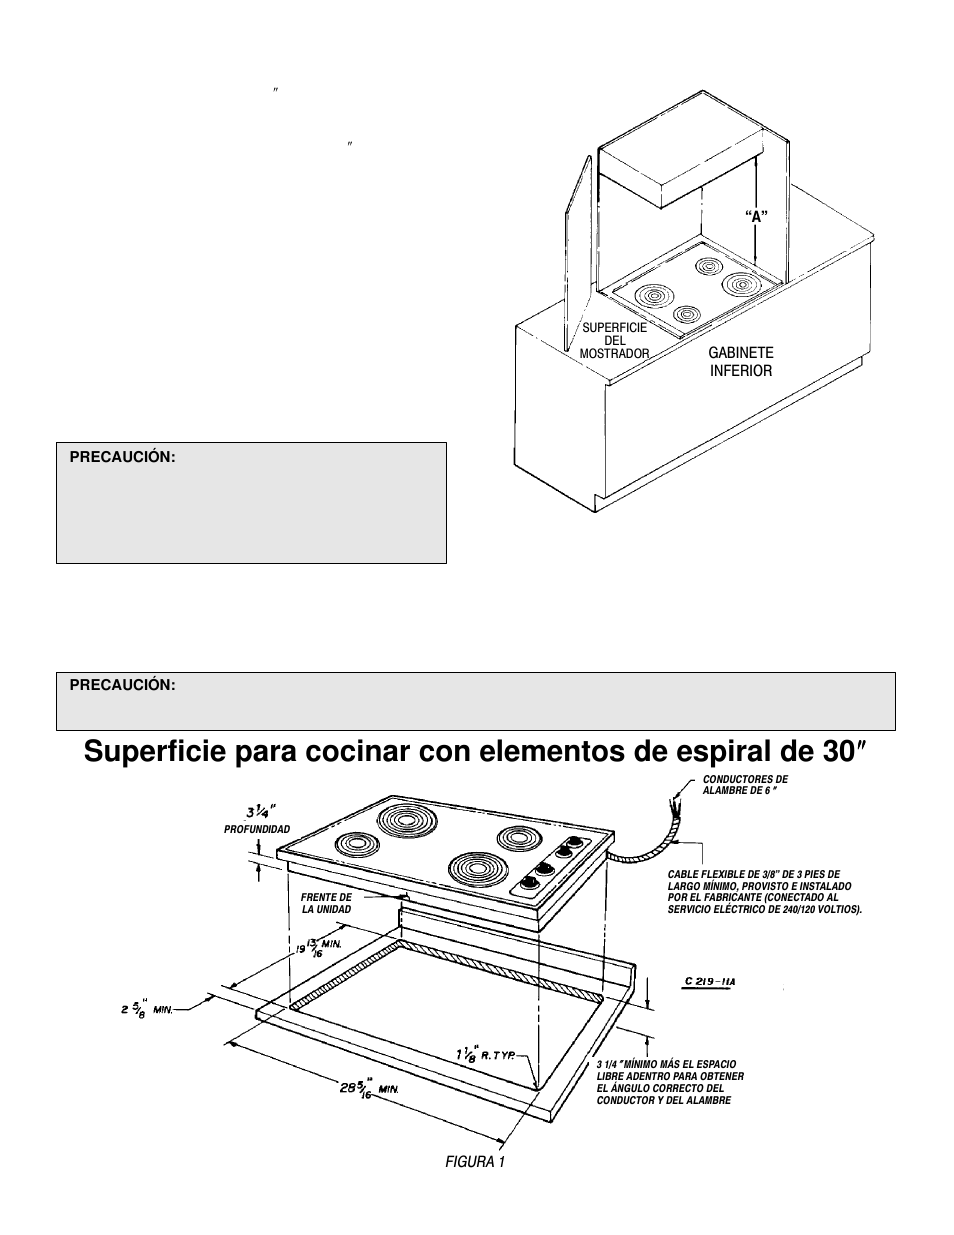 maytag cse9000ace installation user manual page 5 9 original rh manualsdir com maytag mmv4206fz installation manual maytag mdb4949sdz installation manual